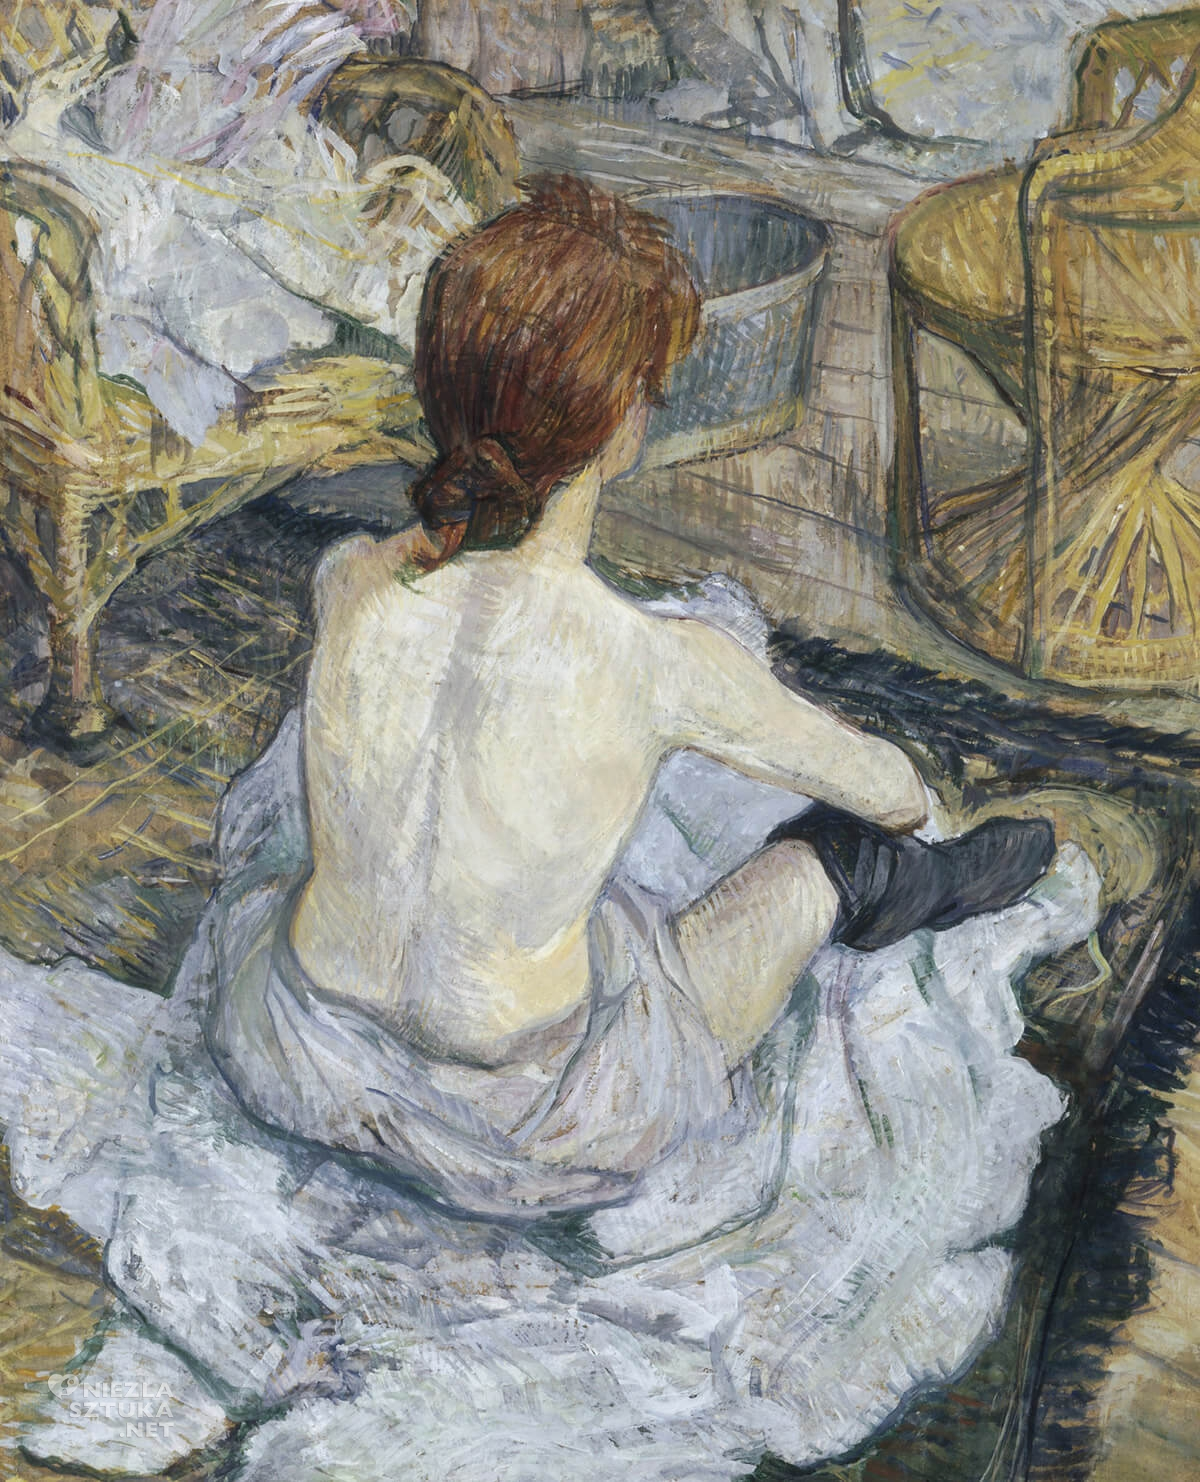 Henri de Toulouse-Lautrec, Toaleta, sztuka francuska, Niezła Sztuka